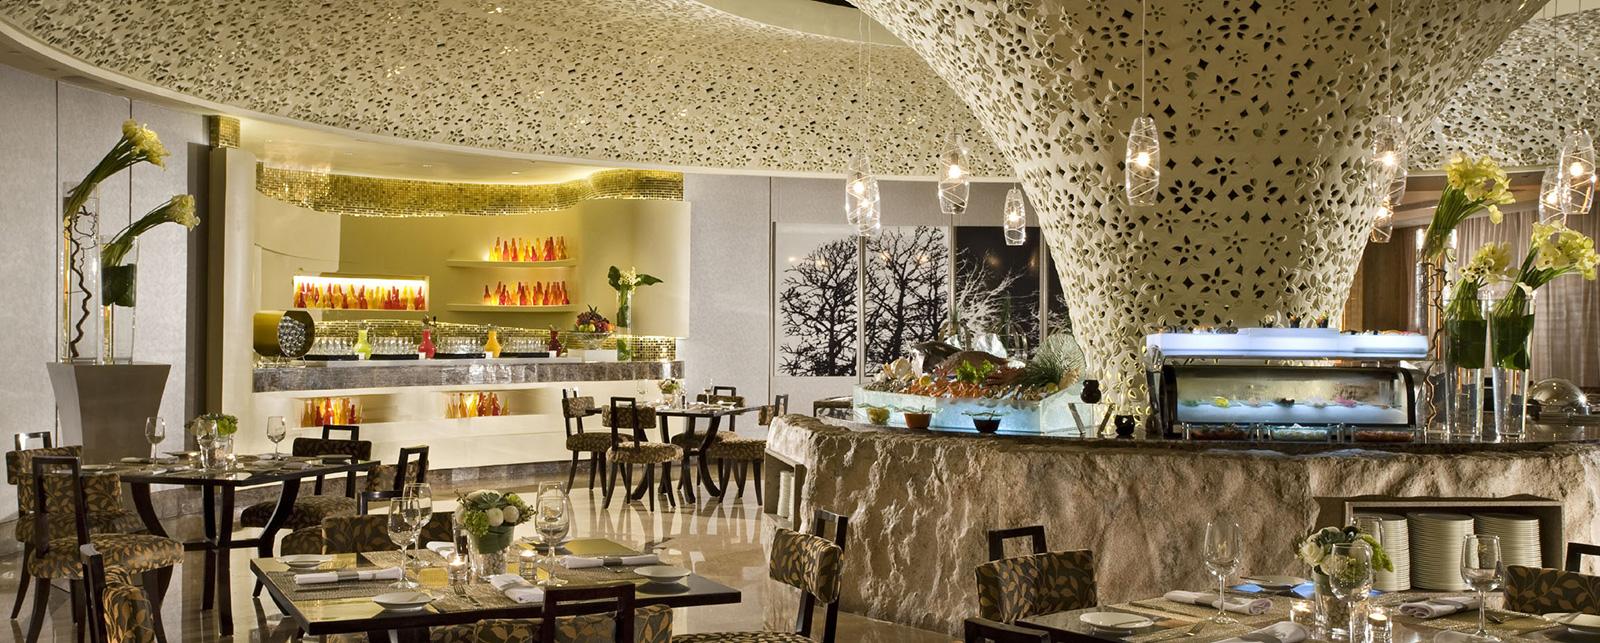 The Café International Fine Dining Hotel Mulia Senayan Jakarta